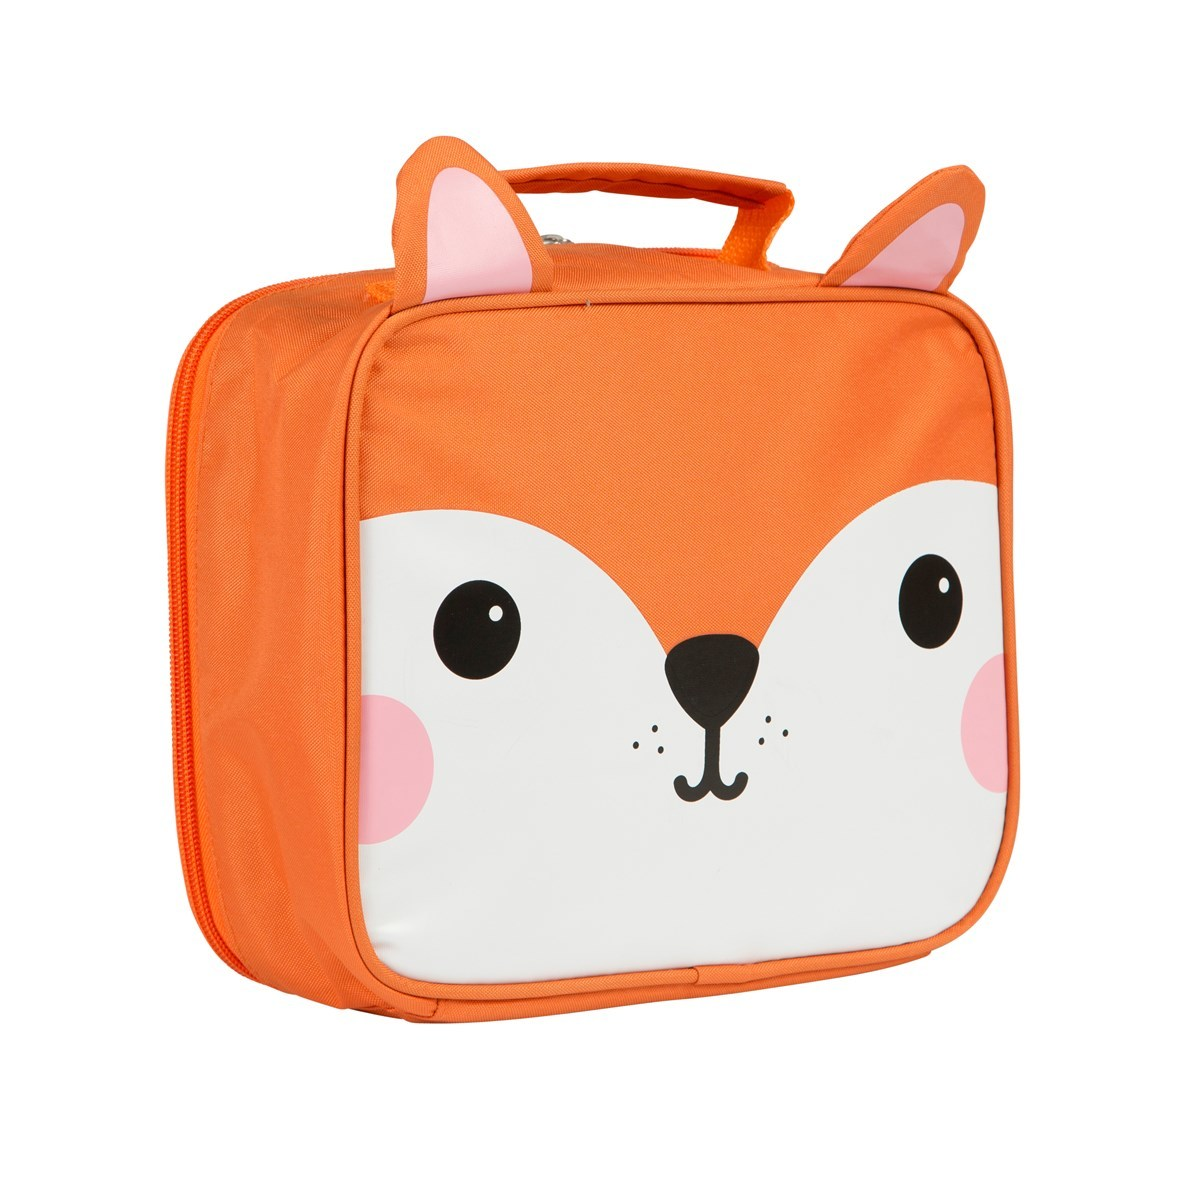 Hiro Fox Kawaii Friends Lunch Bag image